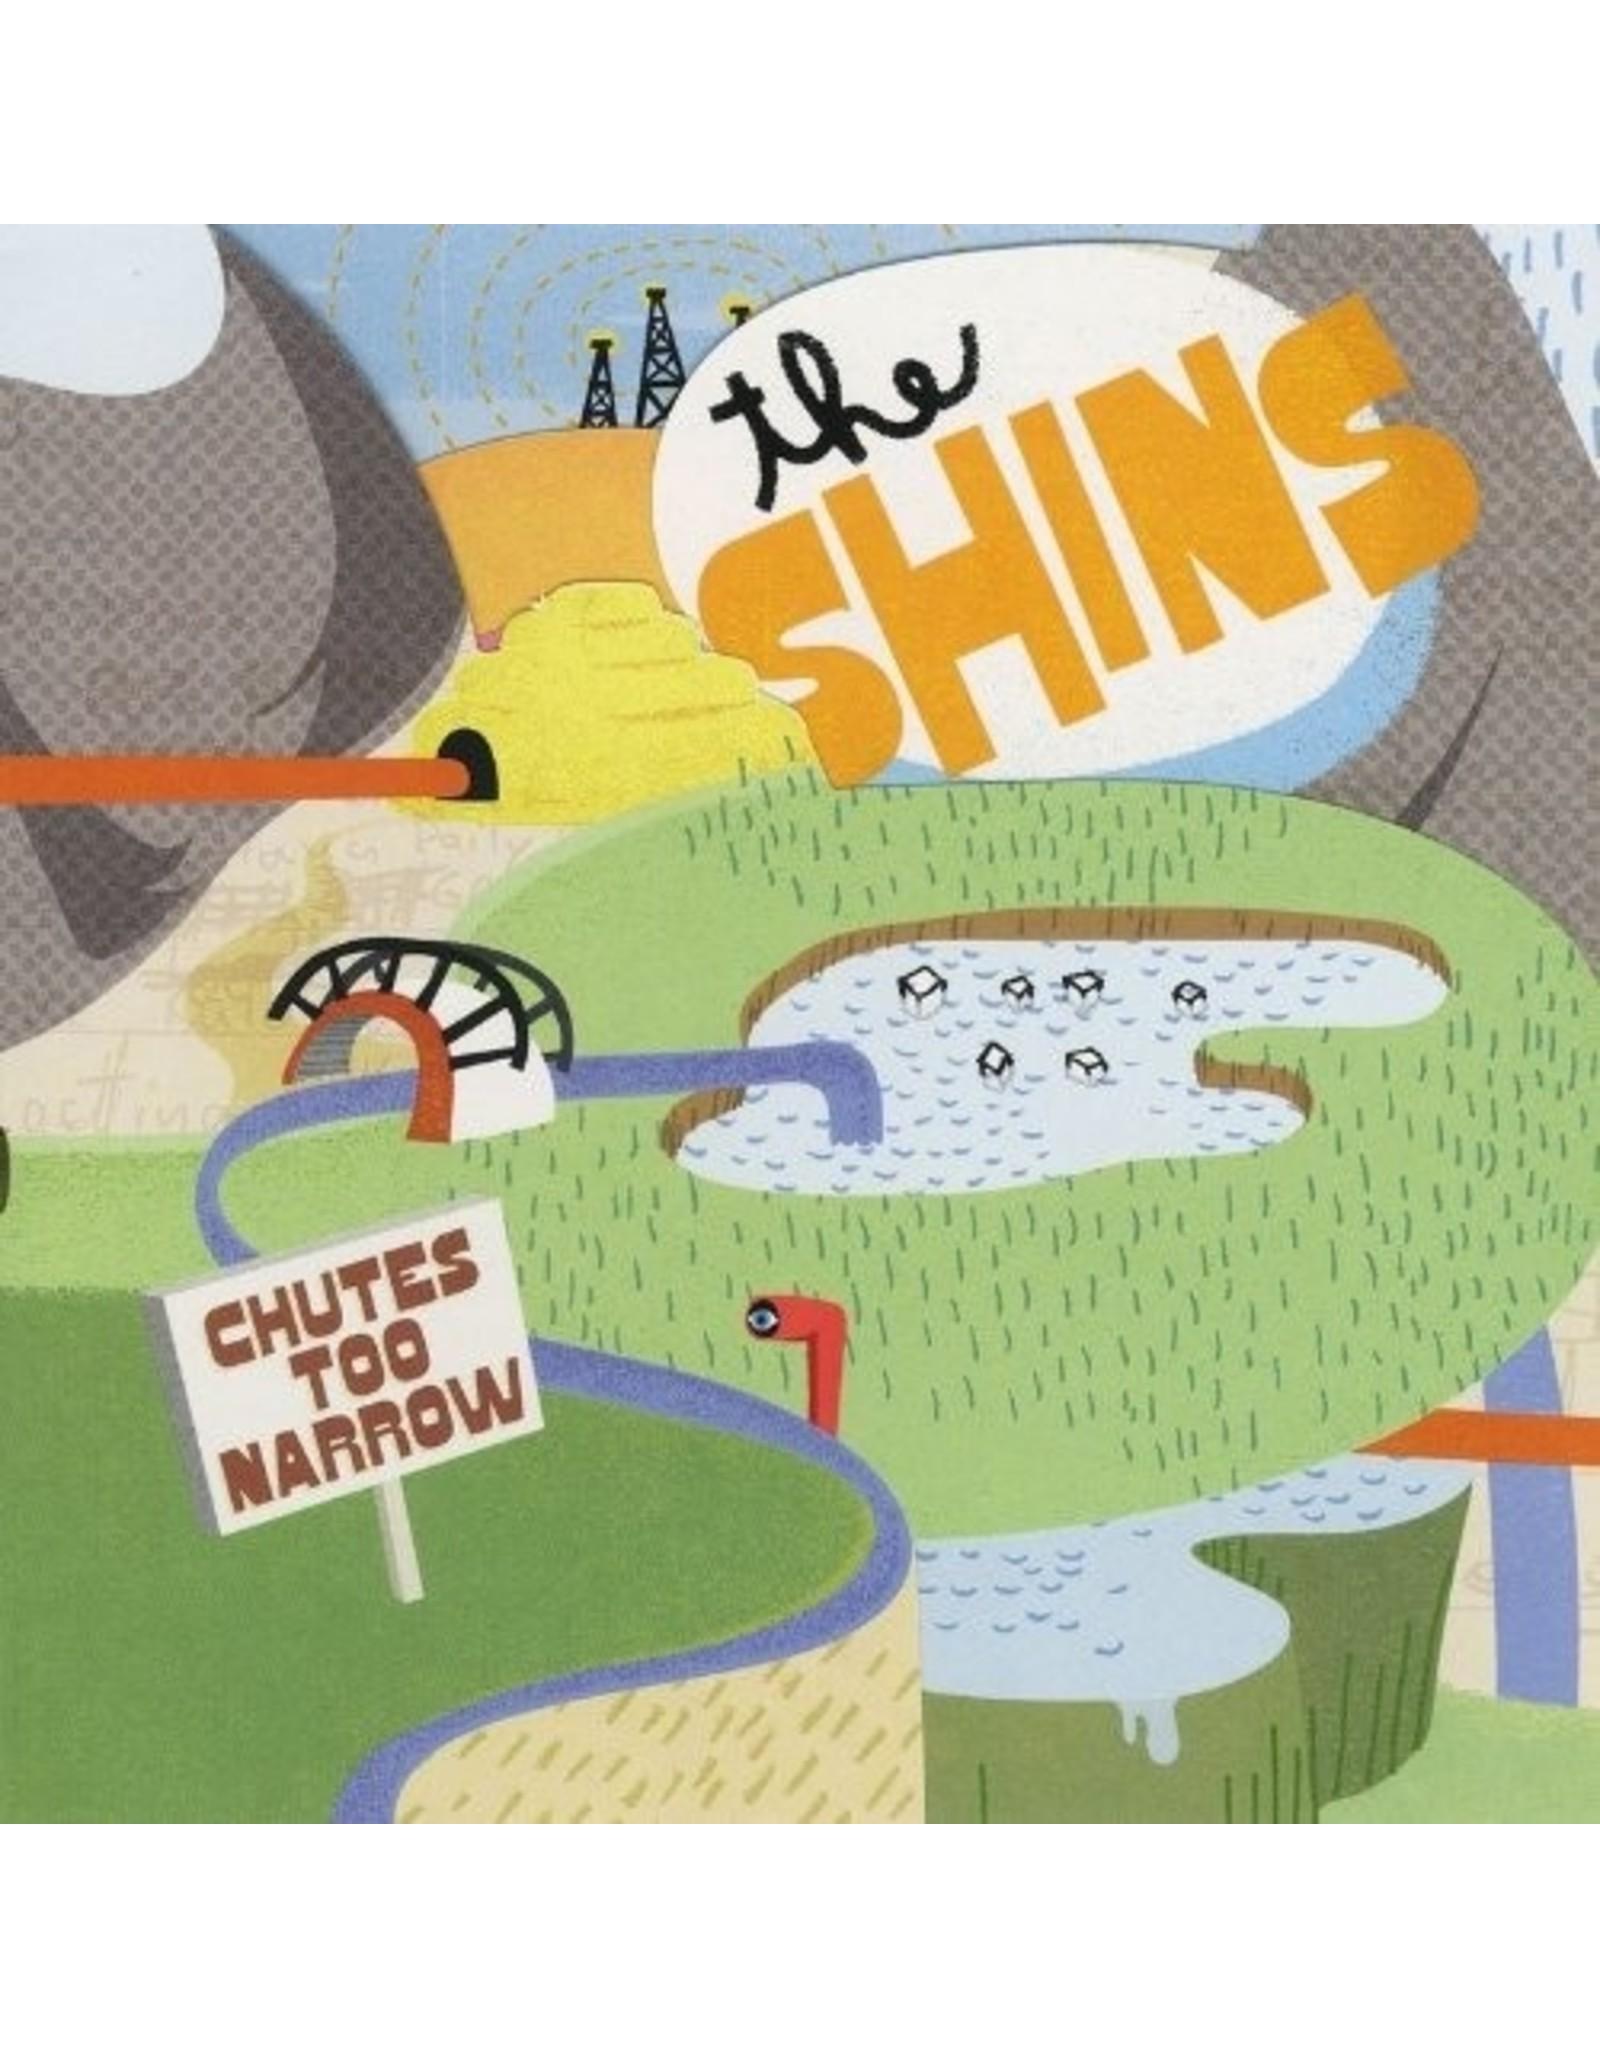 New Vinyl The Shins - Chutes Too Narrow LP